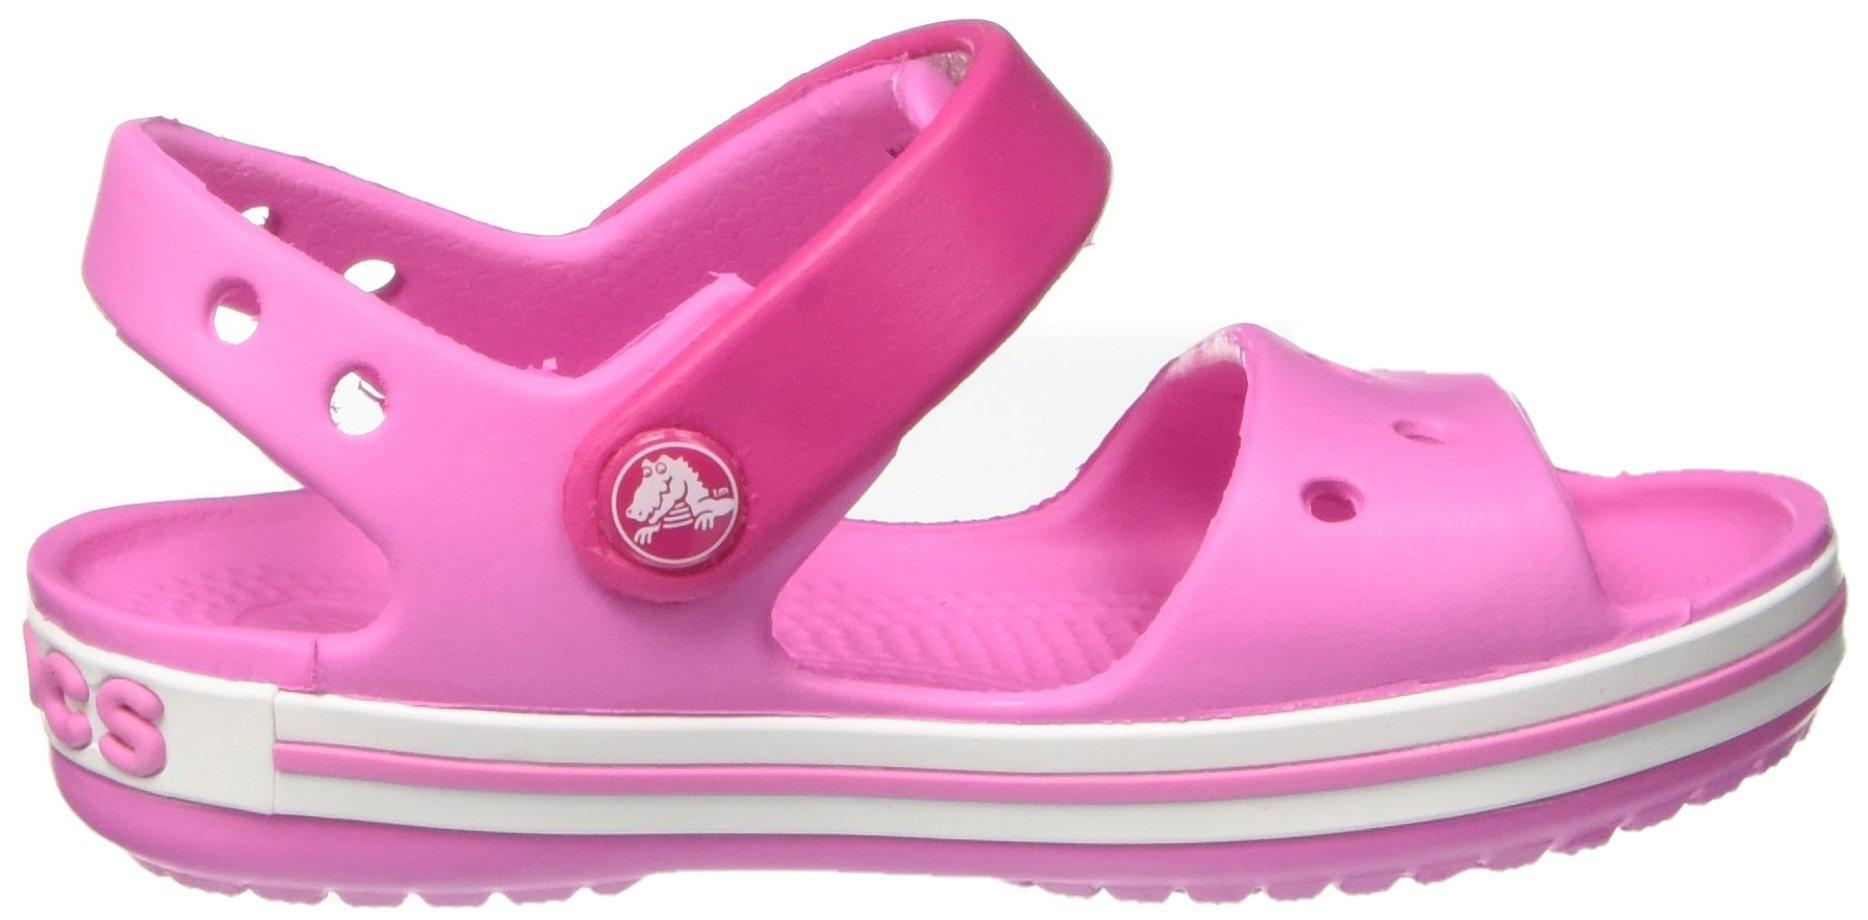 Crocs Crocband  Fun Lab   Light-Up Clog, Pink, C6 M US Toddler by Crocs (Image #15)